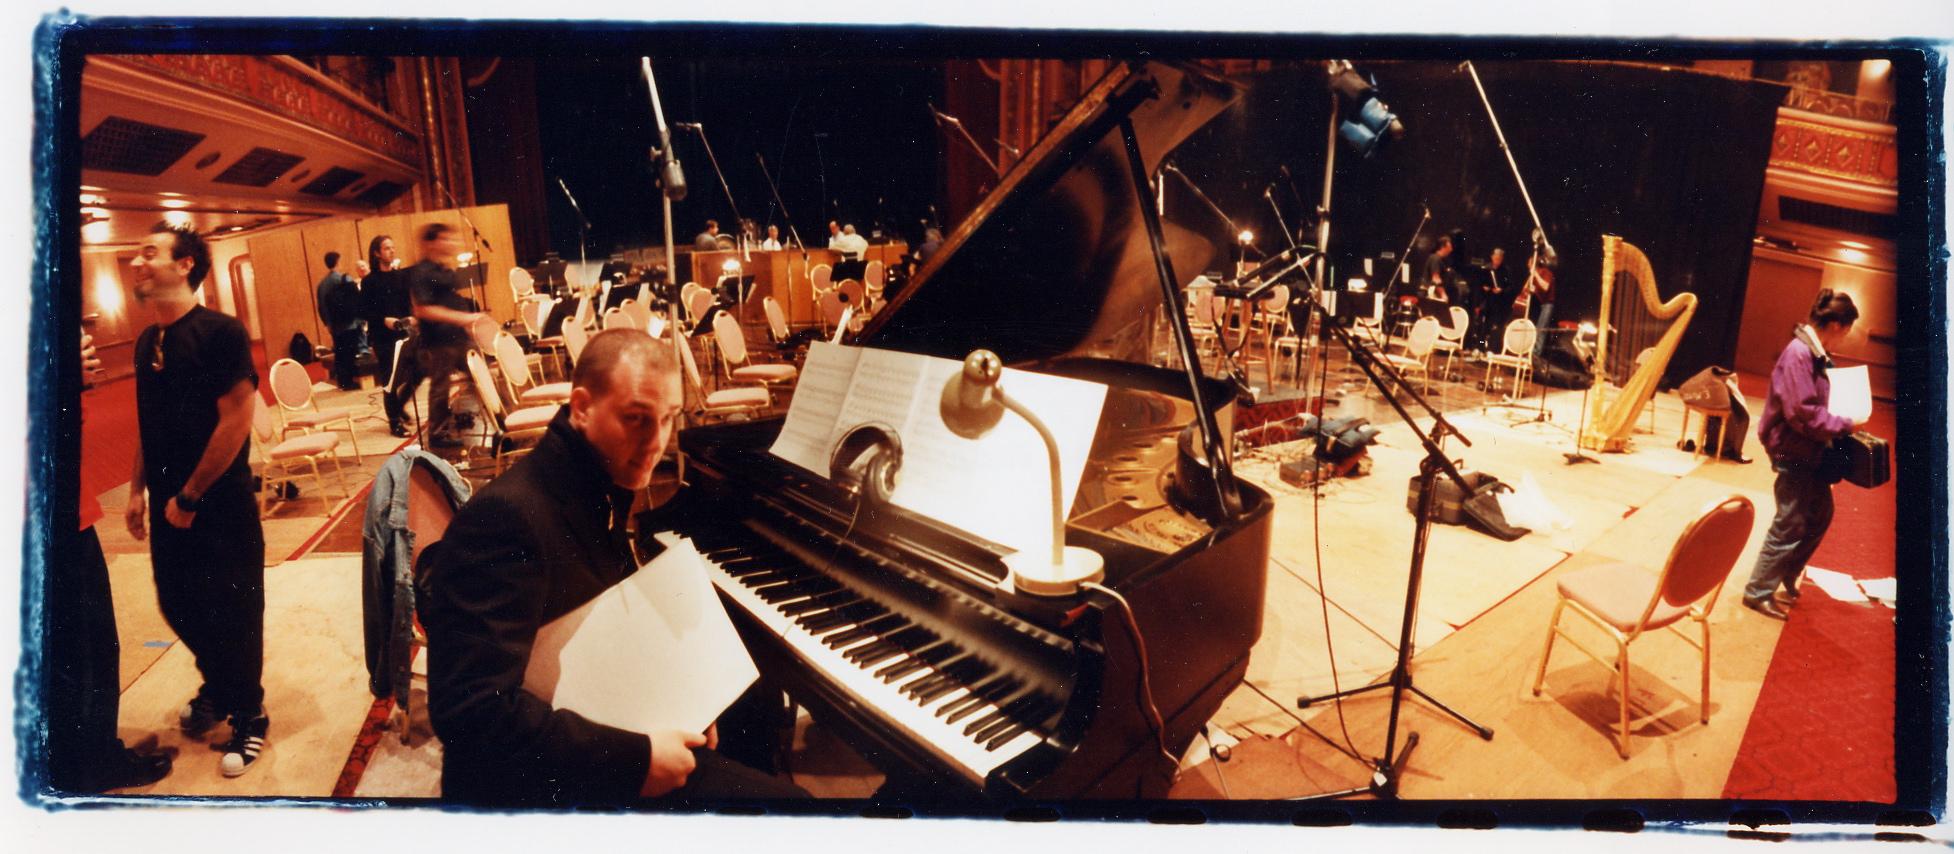 J. Ralph Orchestra photo credit C. Taylor Crothers.jpg